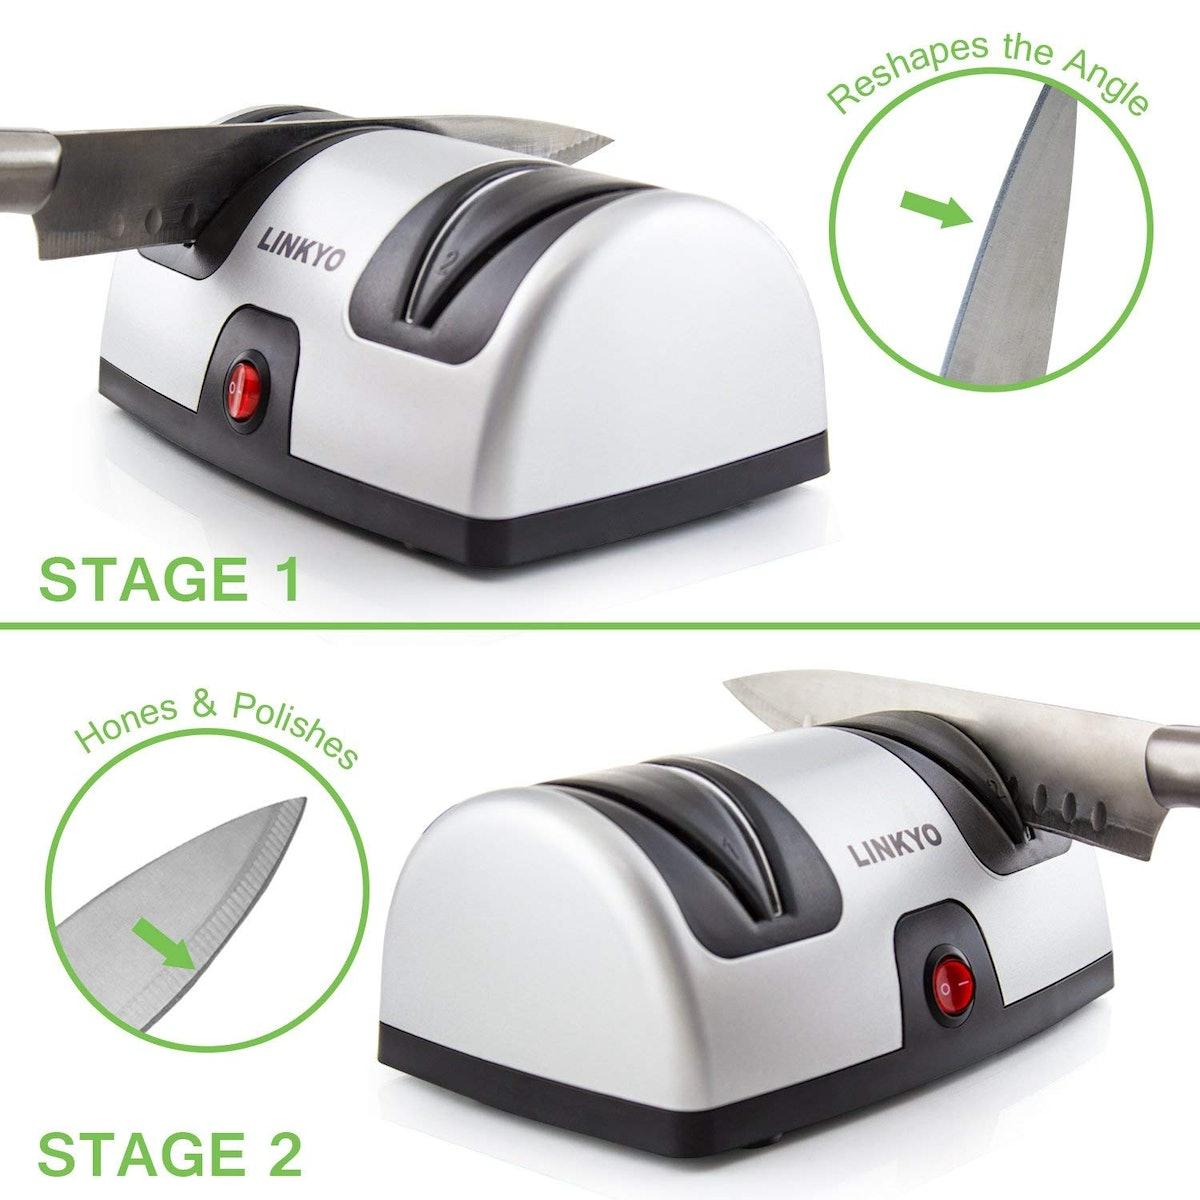 LINKYO Electric Knife Sharpener